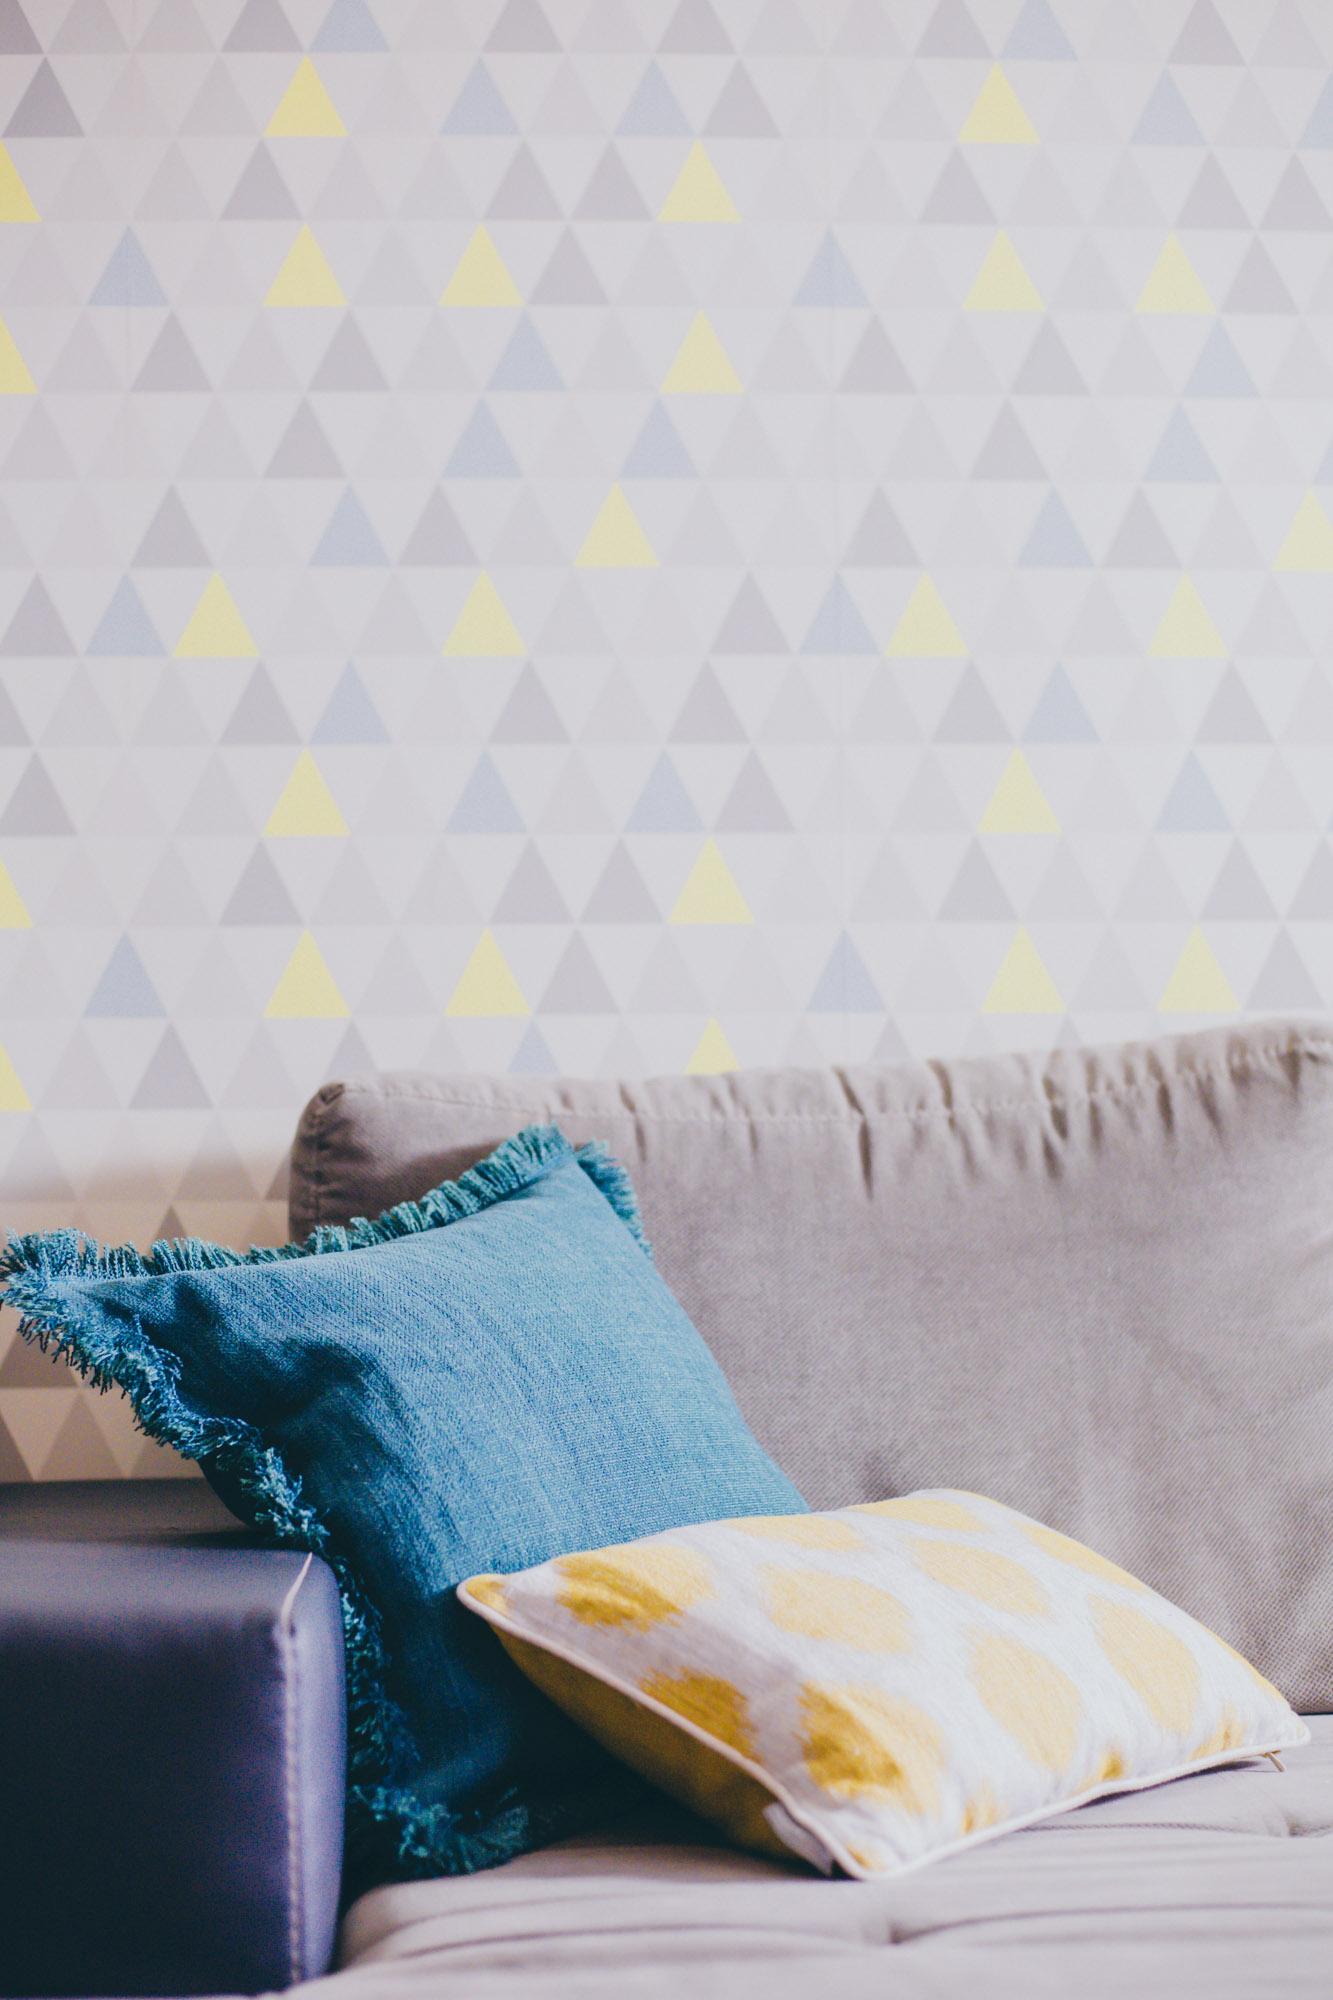 6-coussinmoonjaneiro-jaune-coussingabriel-bleu-toilesdemayenne-photocouverture-chaperchee-blog-lifestyle-strasbourg-decoration-salon-ambiance-cosy